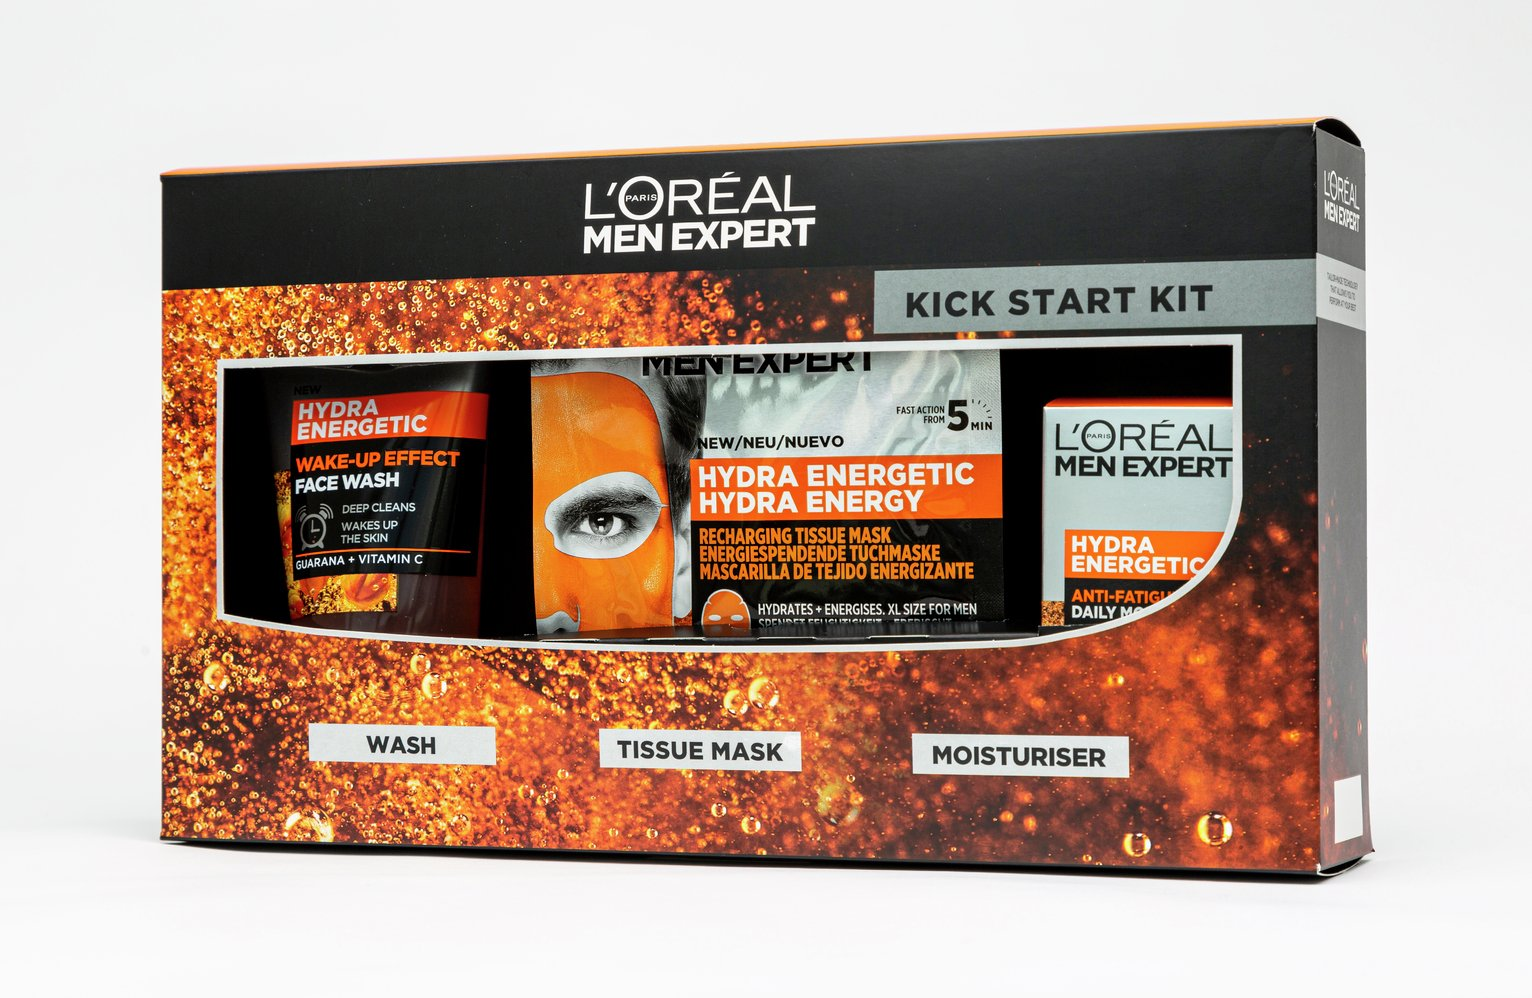 L'Oreal Paris Men Expert Kickstart Kit